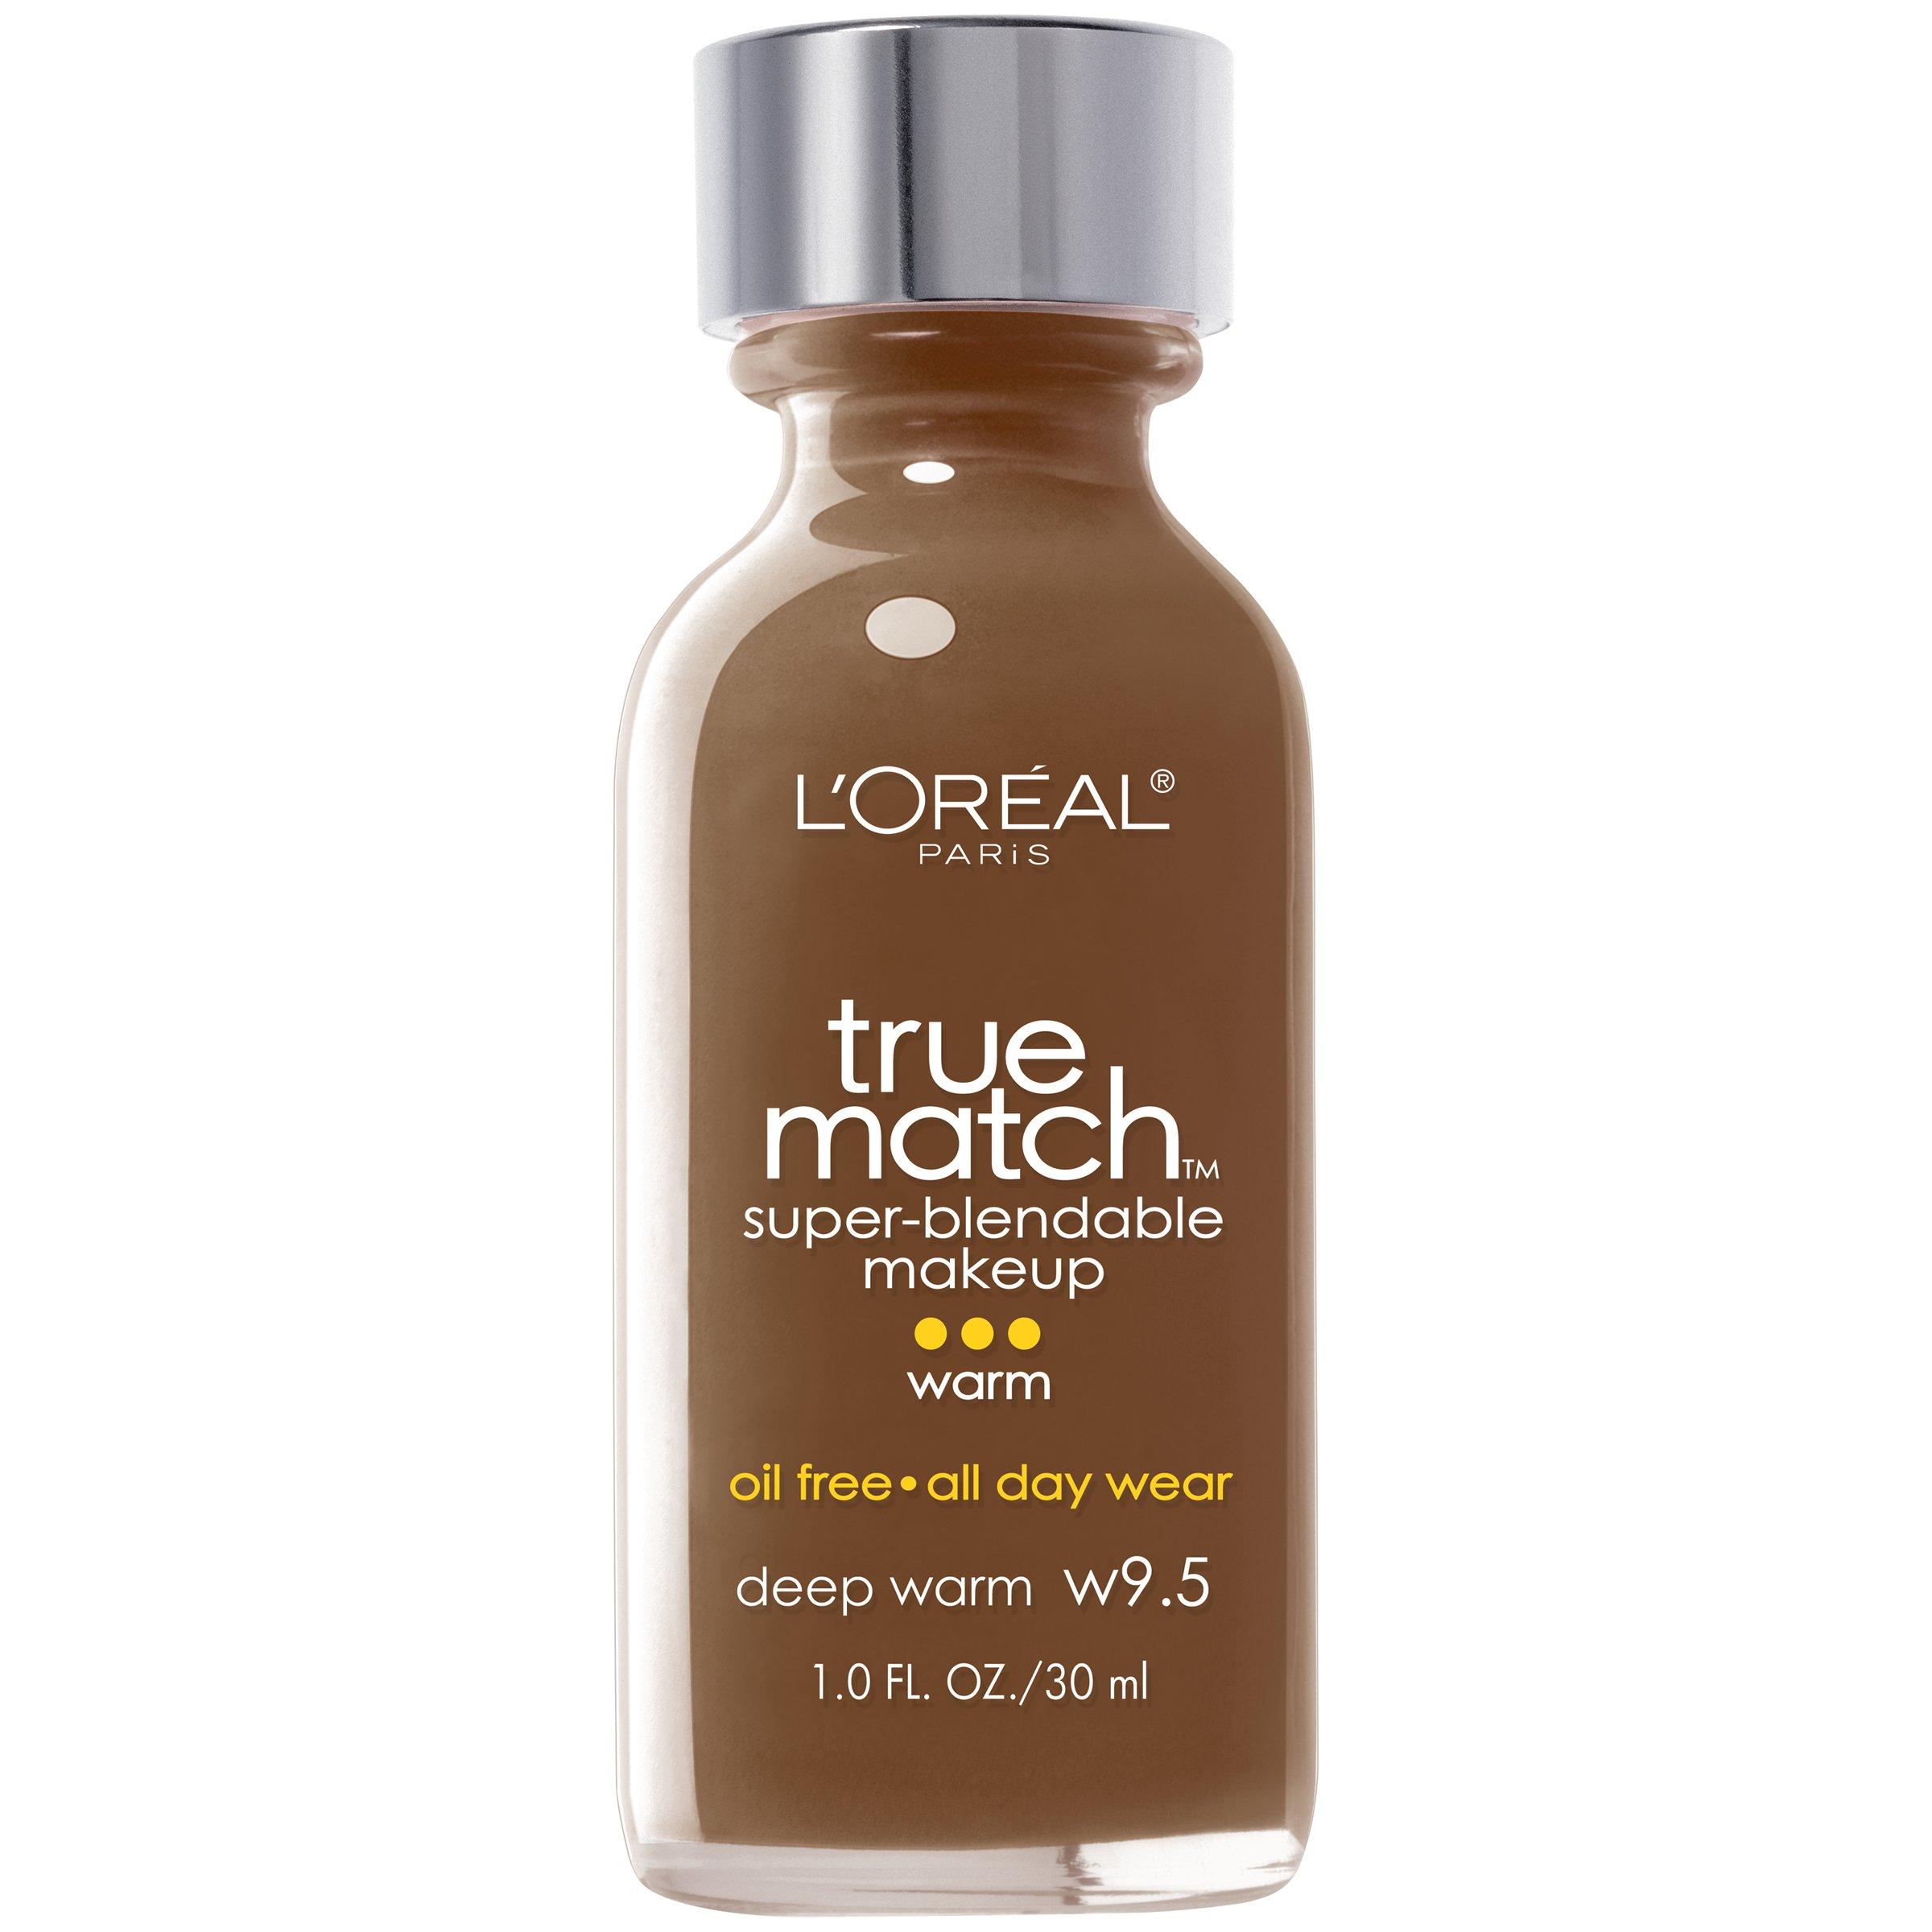 L'Oreal Paris Makeup True Match Super-Blendable Liquid Foundation, Deep Warm W9.5, 1 Fl Oz,1 Count